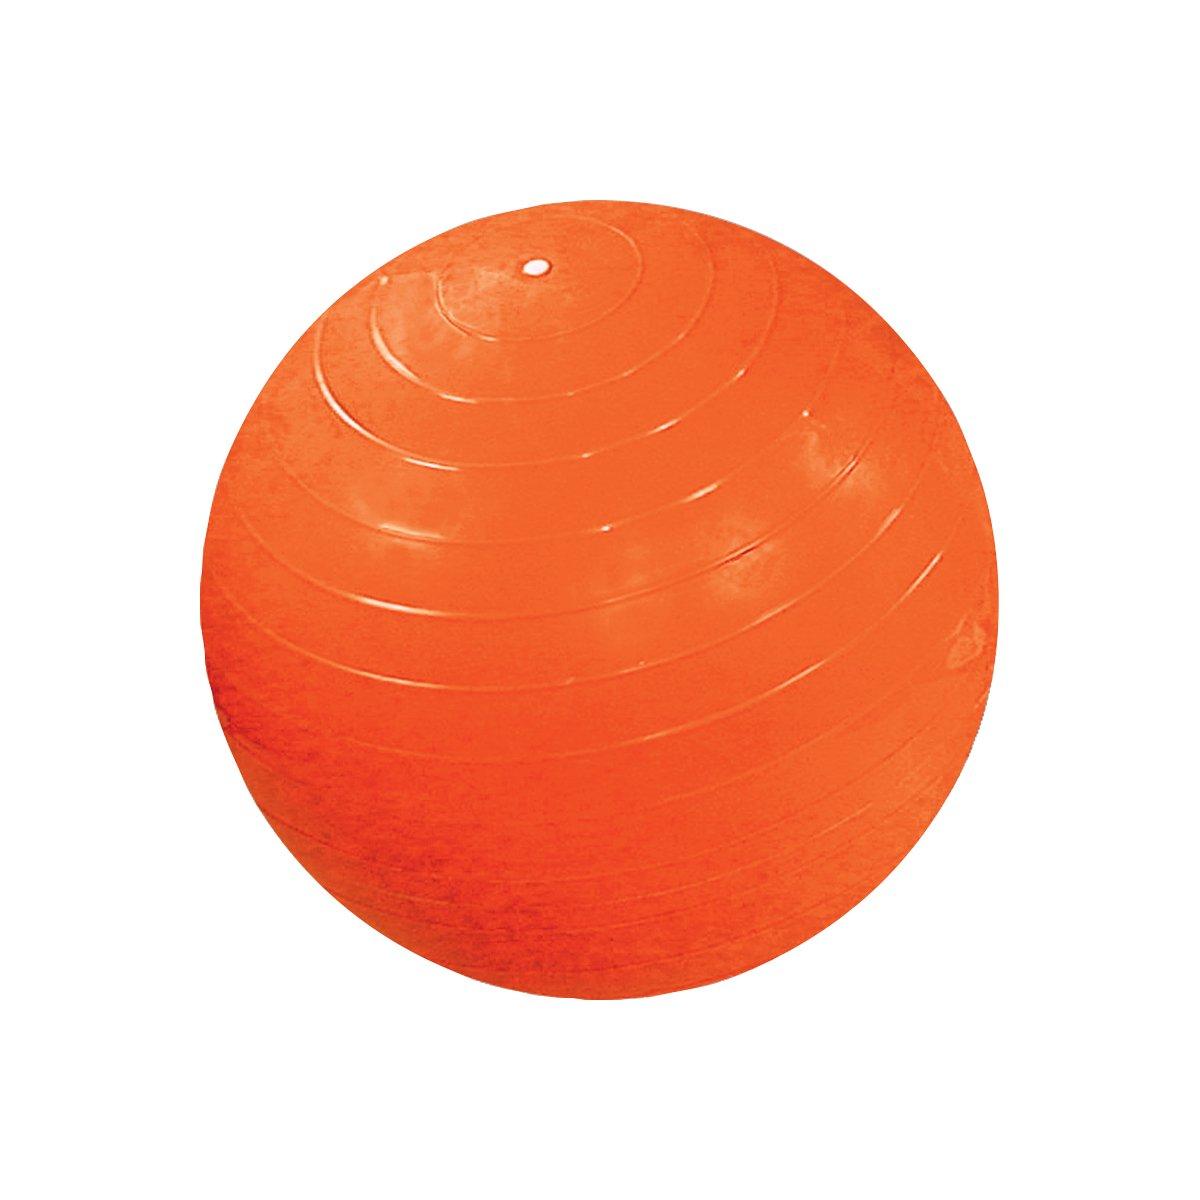 Cando 30-1807 Orange Non-Slip PVC Vinyl Inflatable Exercise Ball, 48'' Diameter, 300 lbs Weight Capacity